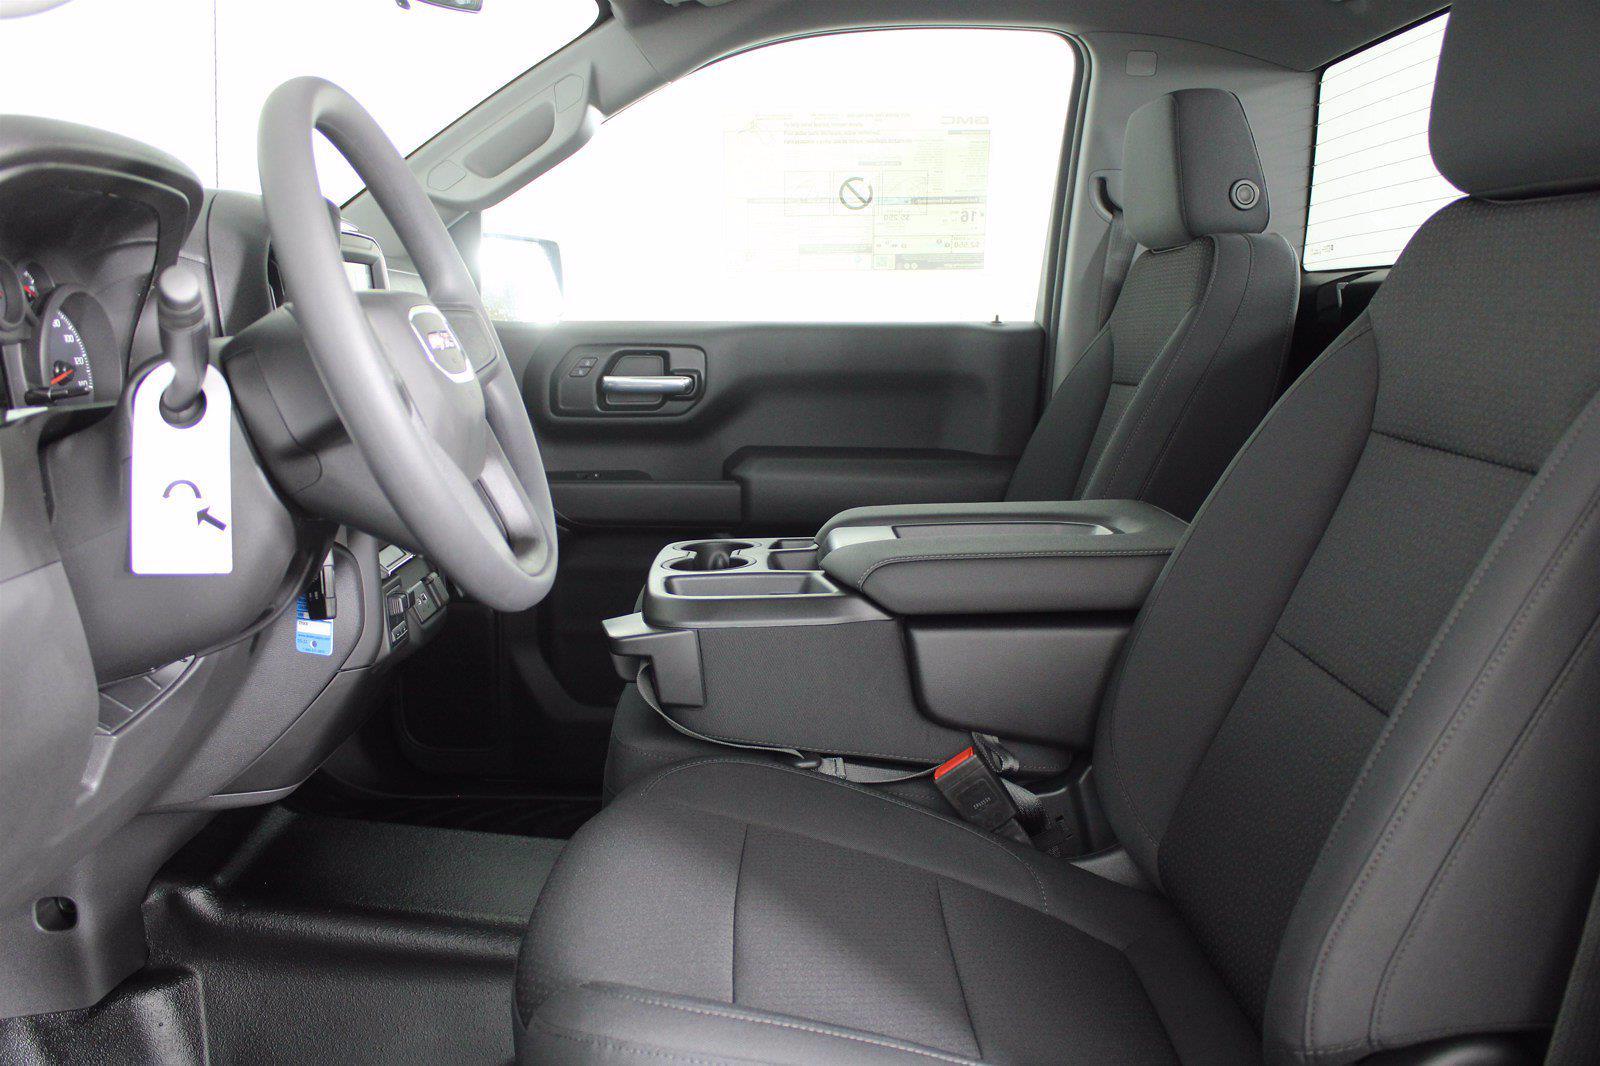 2021 GMC Sierra 1500 Regular Cab 4x4, Pickup #D411131 - photo 14